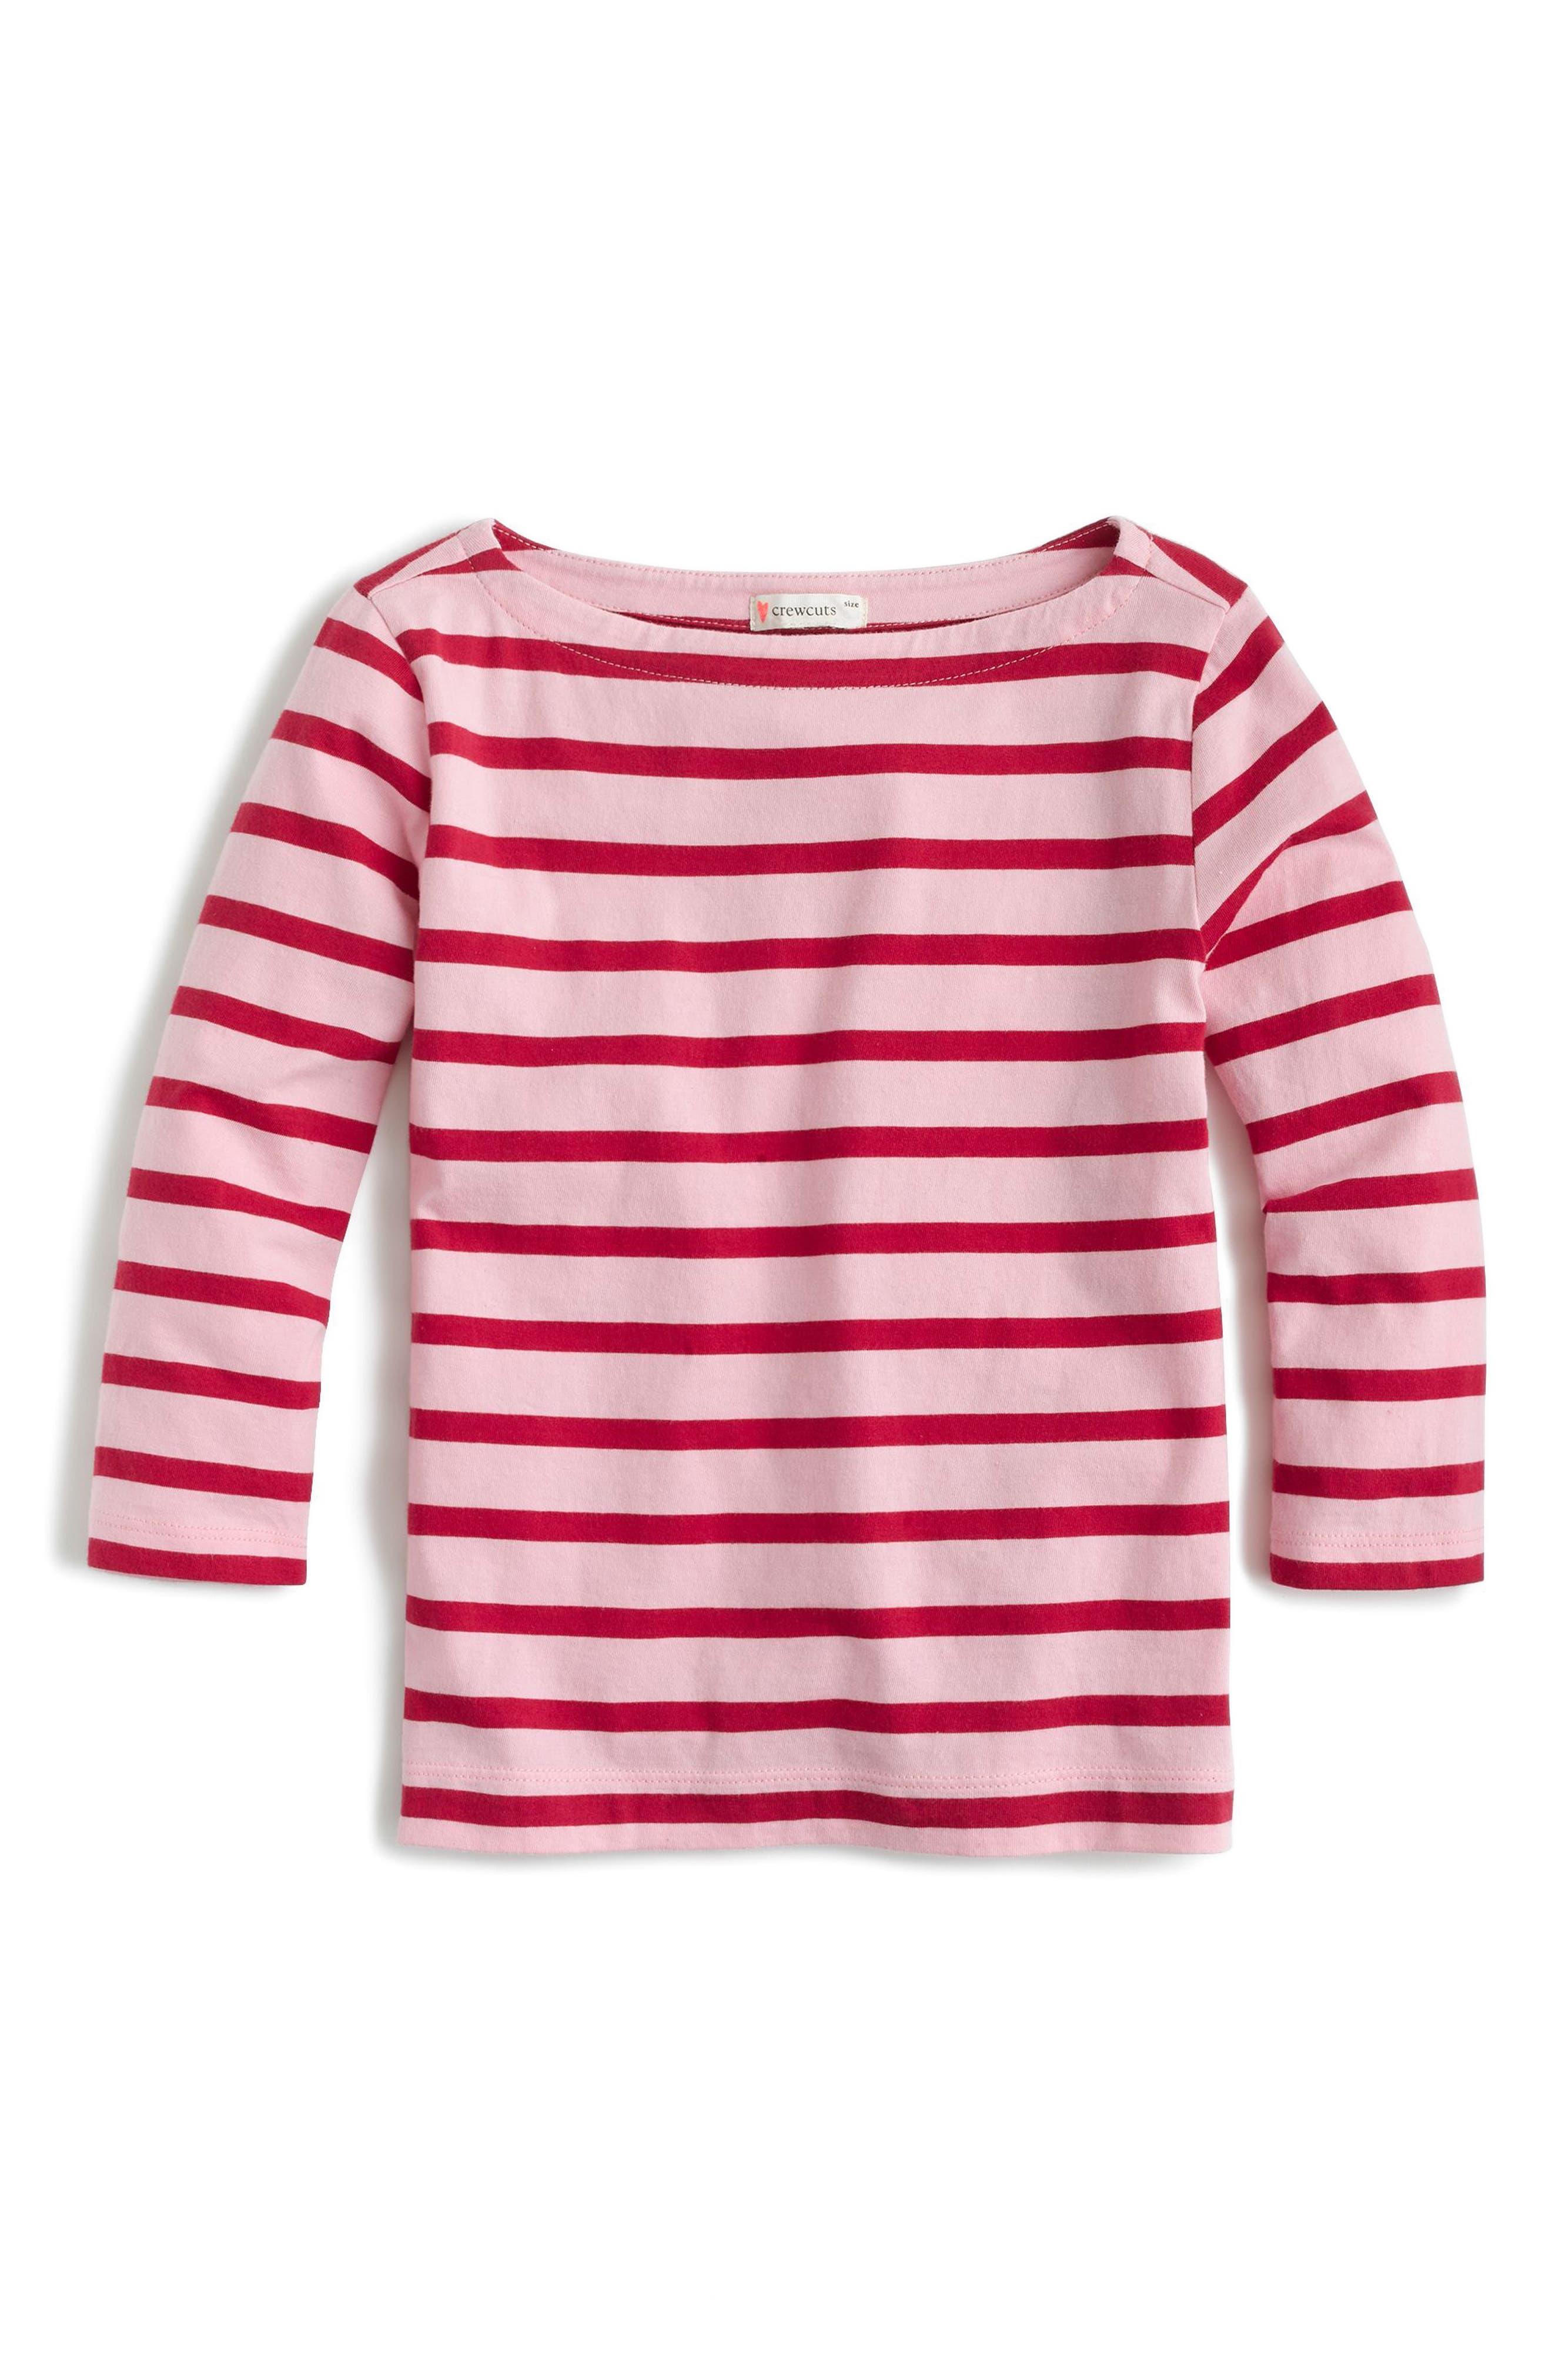 Main Image - crewcuts by J.Crew Classic Stripe T-Shirt (Toddler Girls, Little Girls & Big Girls)